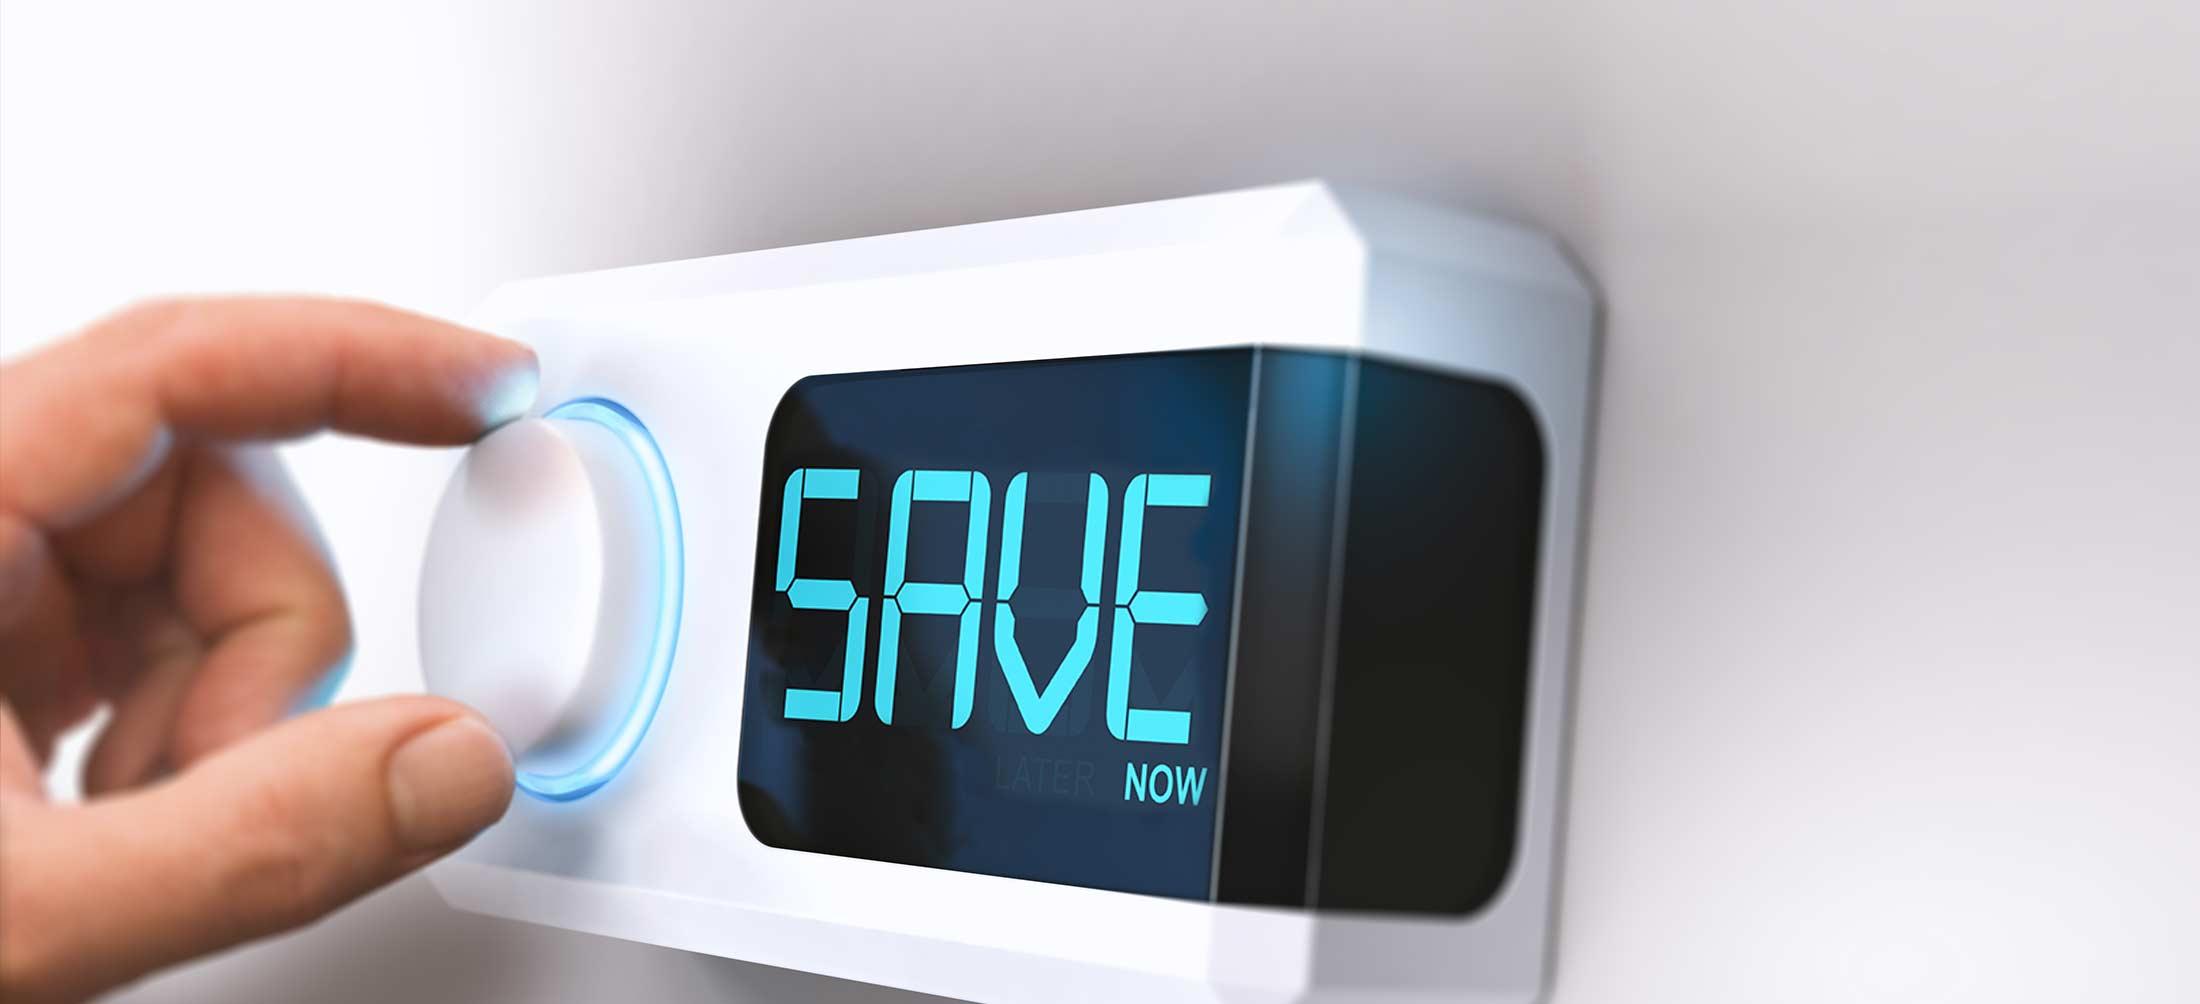 Cut energy bills